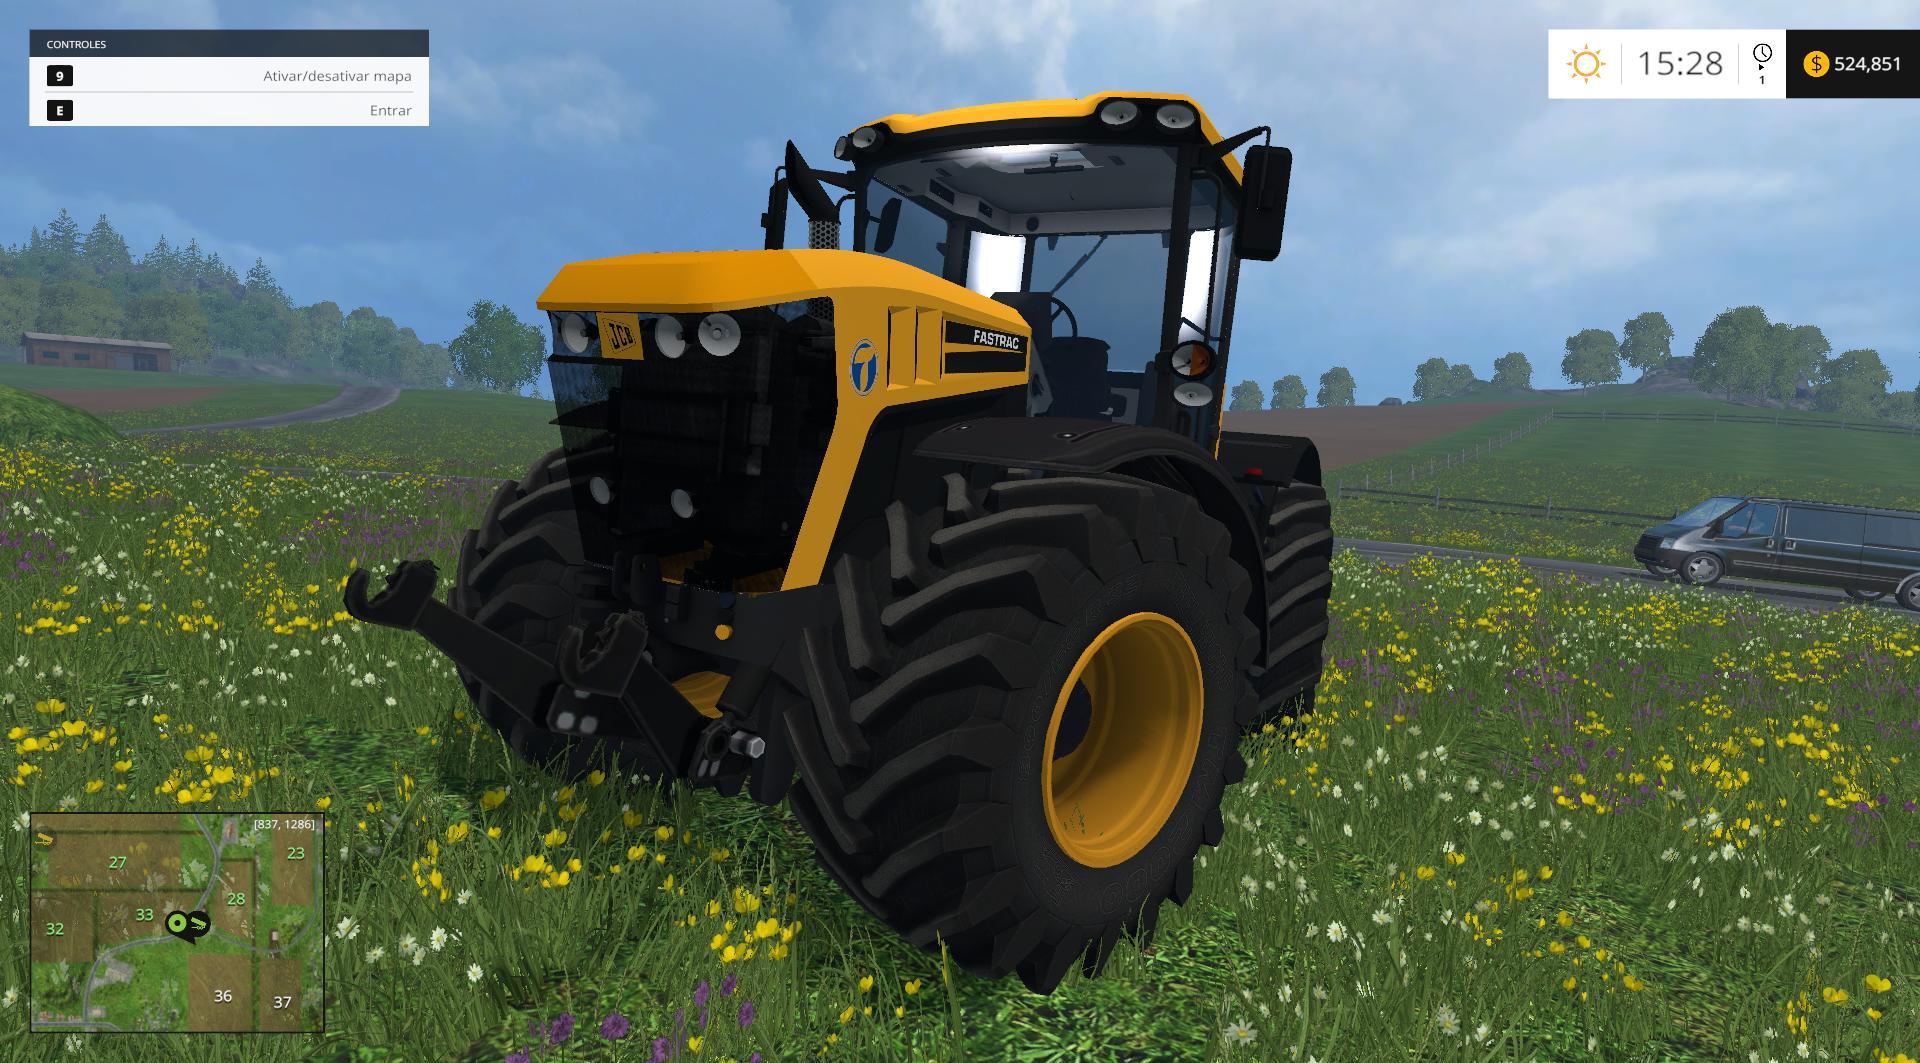 JCB Fastrack 4000 Fs 2015 • Farming simulator 19, 17, 15 mods | FS19